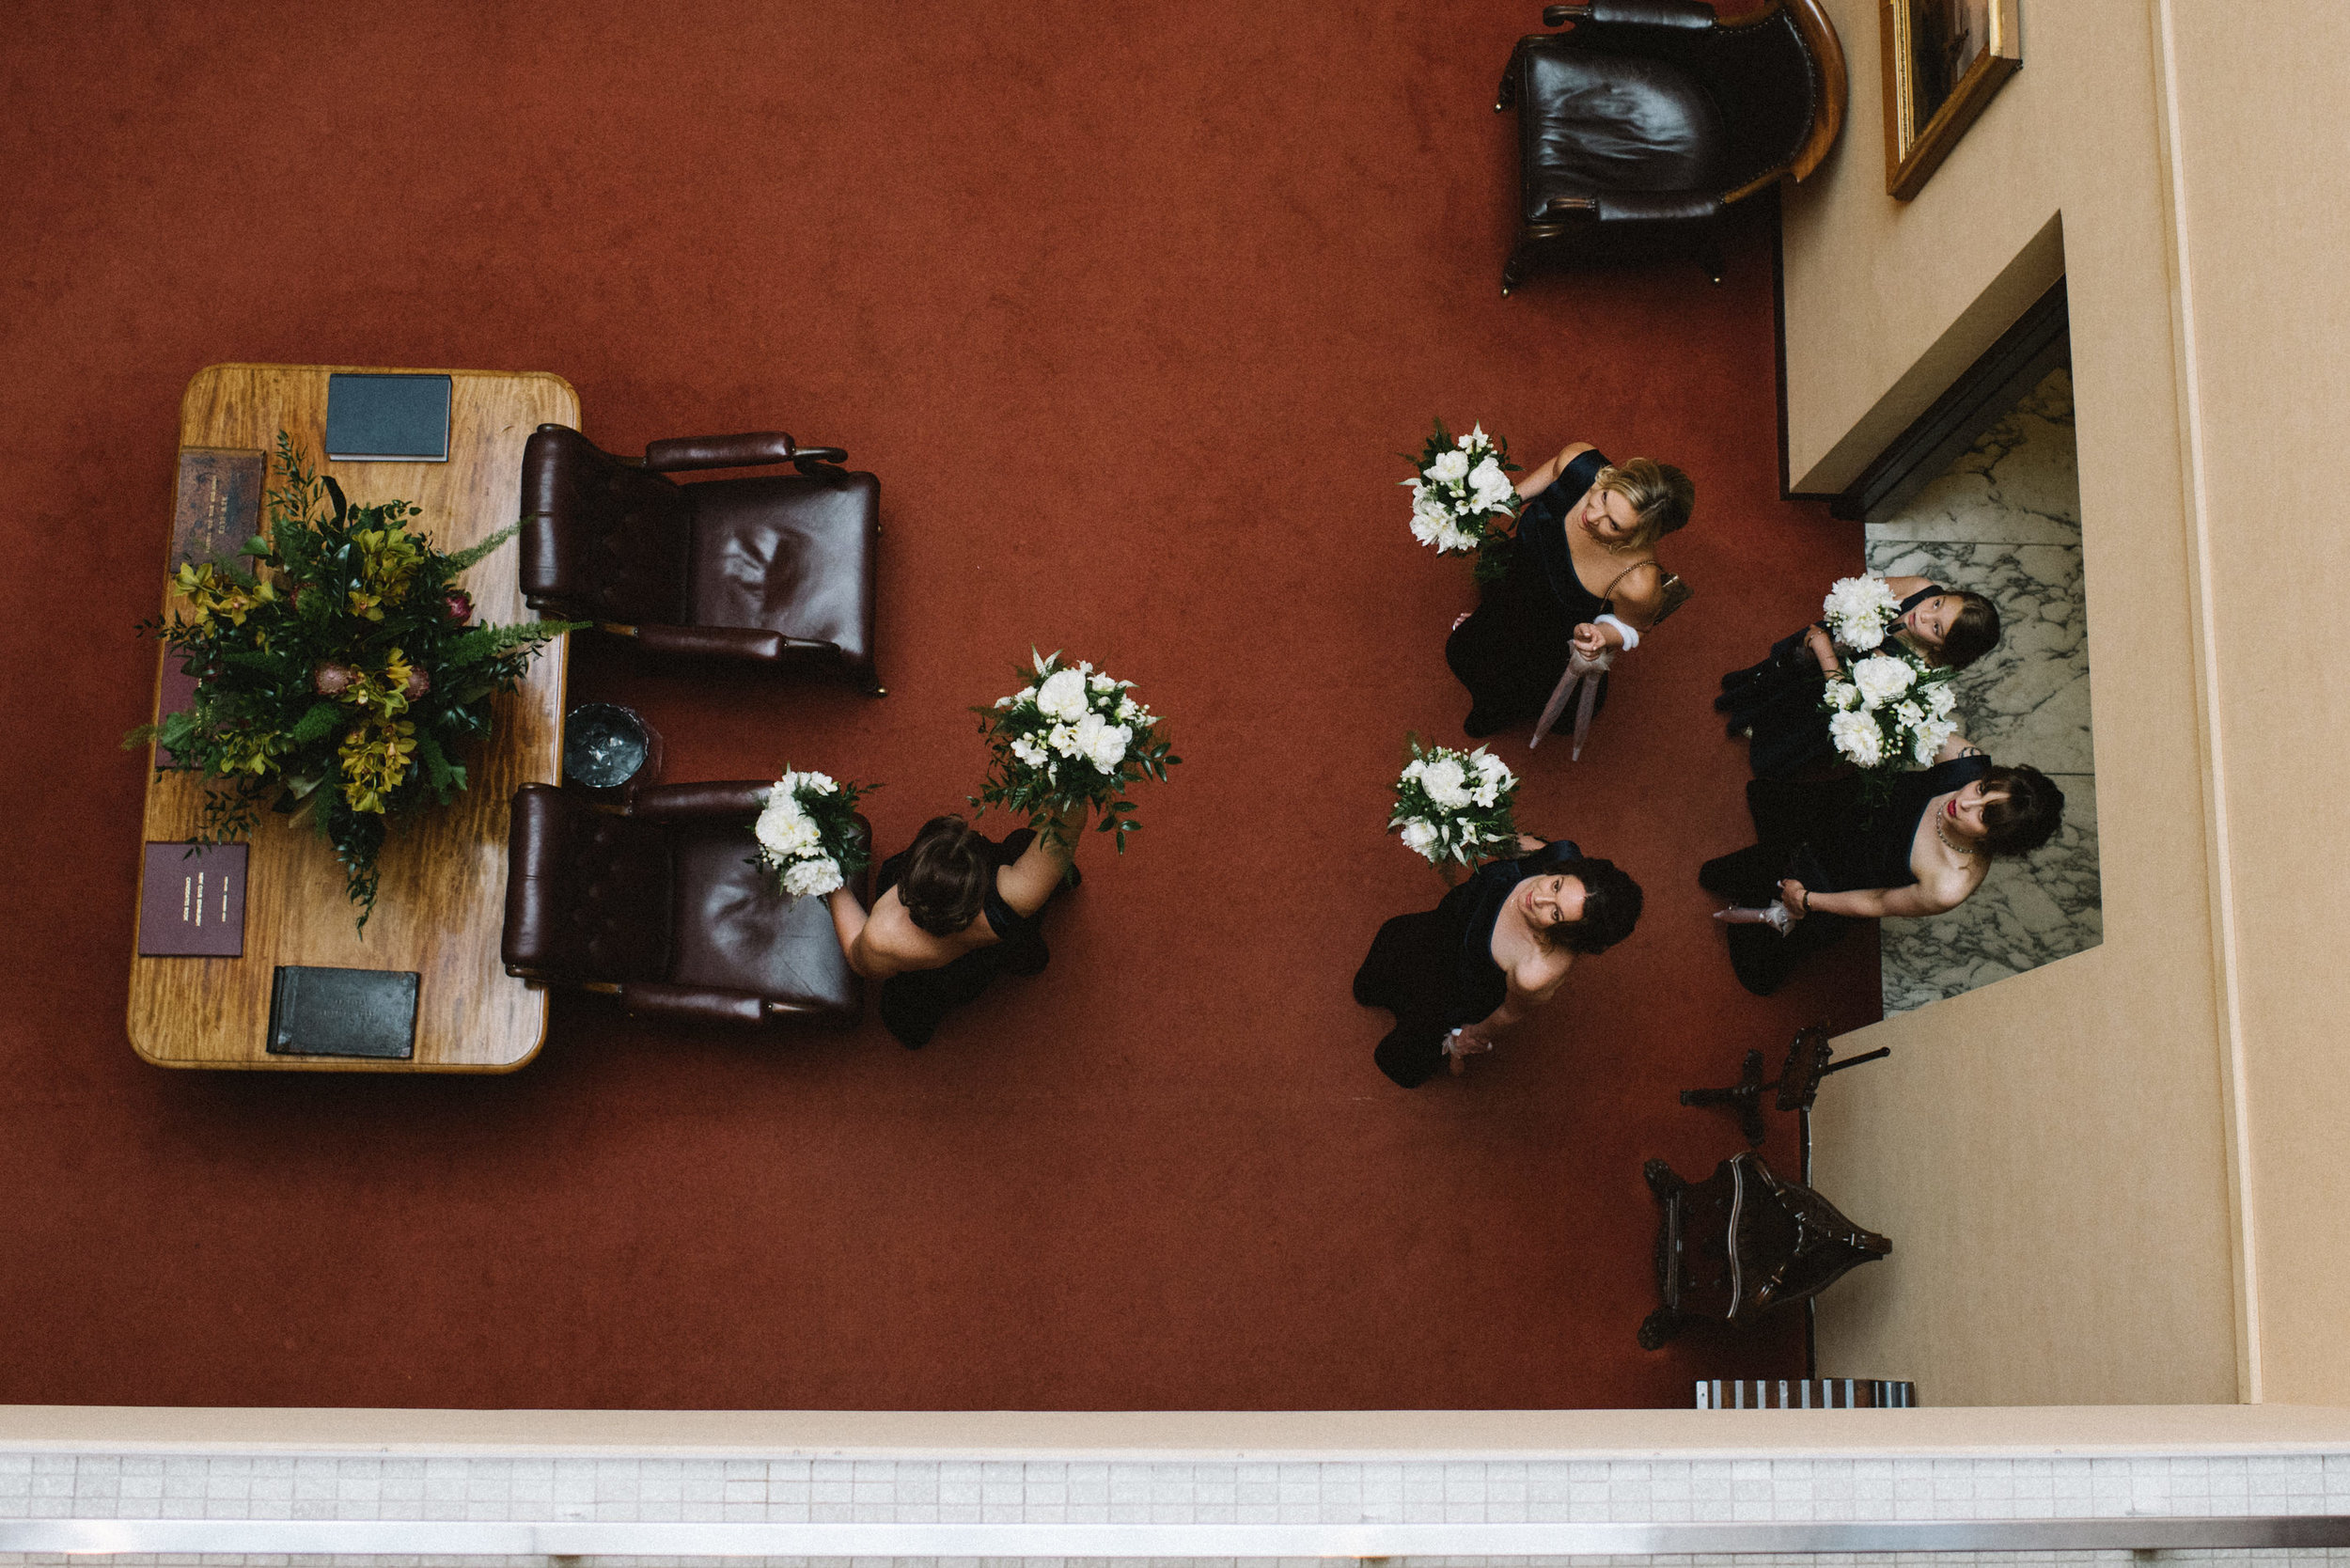 0146-LISA-DEVINE-PHOTOGRAPHY-ALTERNATIVE-WEDDING-PHOTOGRAPHY-SCOTLAND-DESTINATION-WEDDINGS-GLASGOW-WEDDINGS-COOL-WEDDINGS-STYLISH-WEDDINGS.JPG